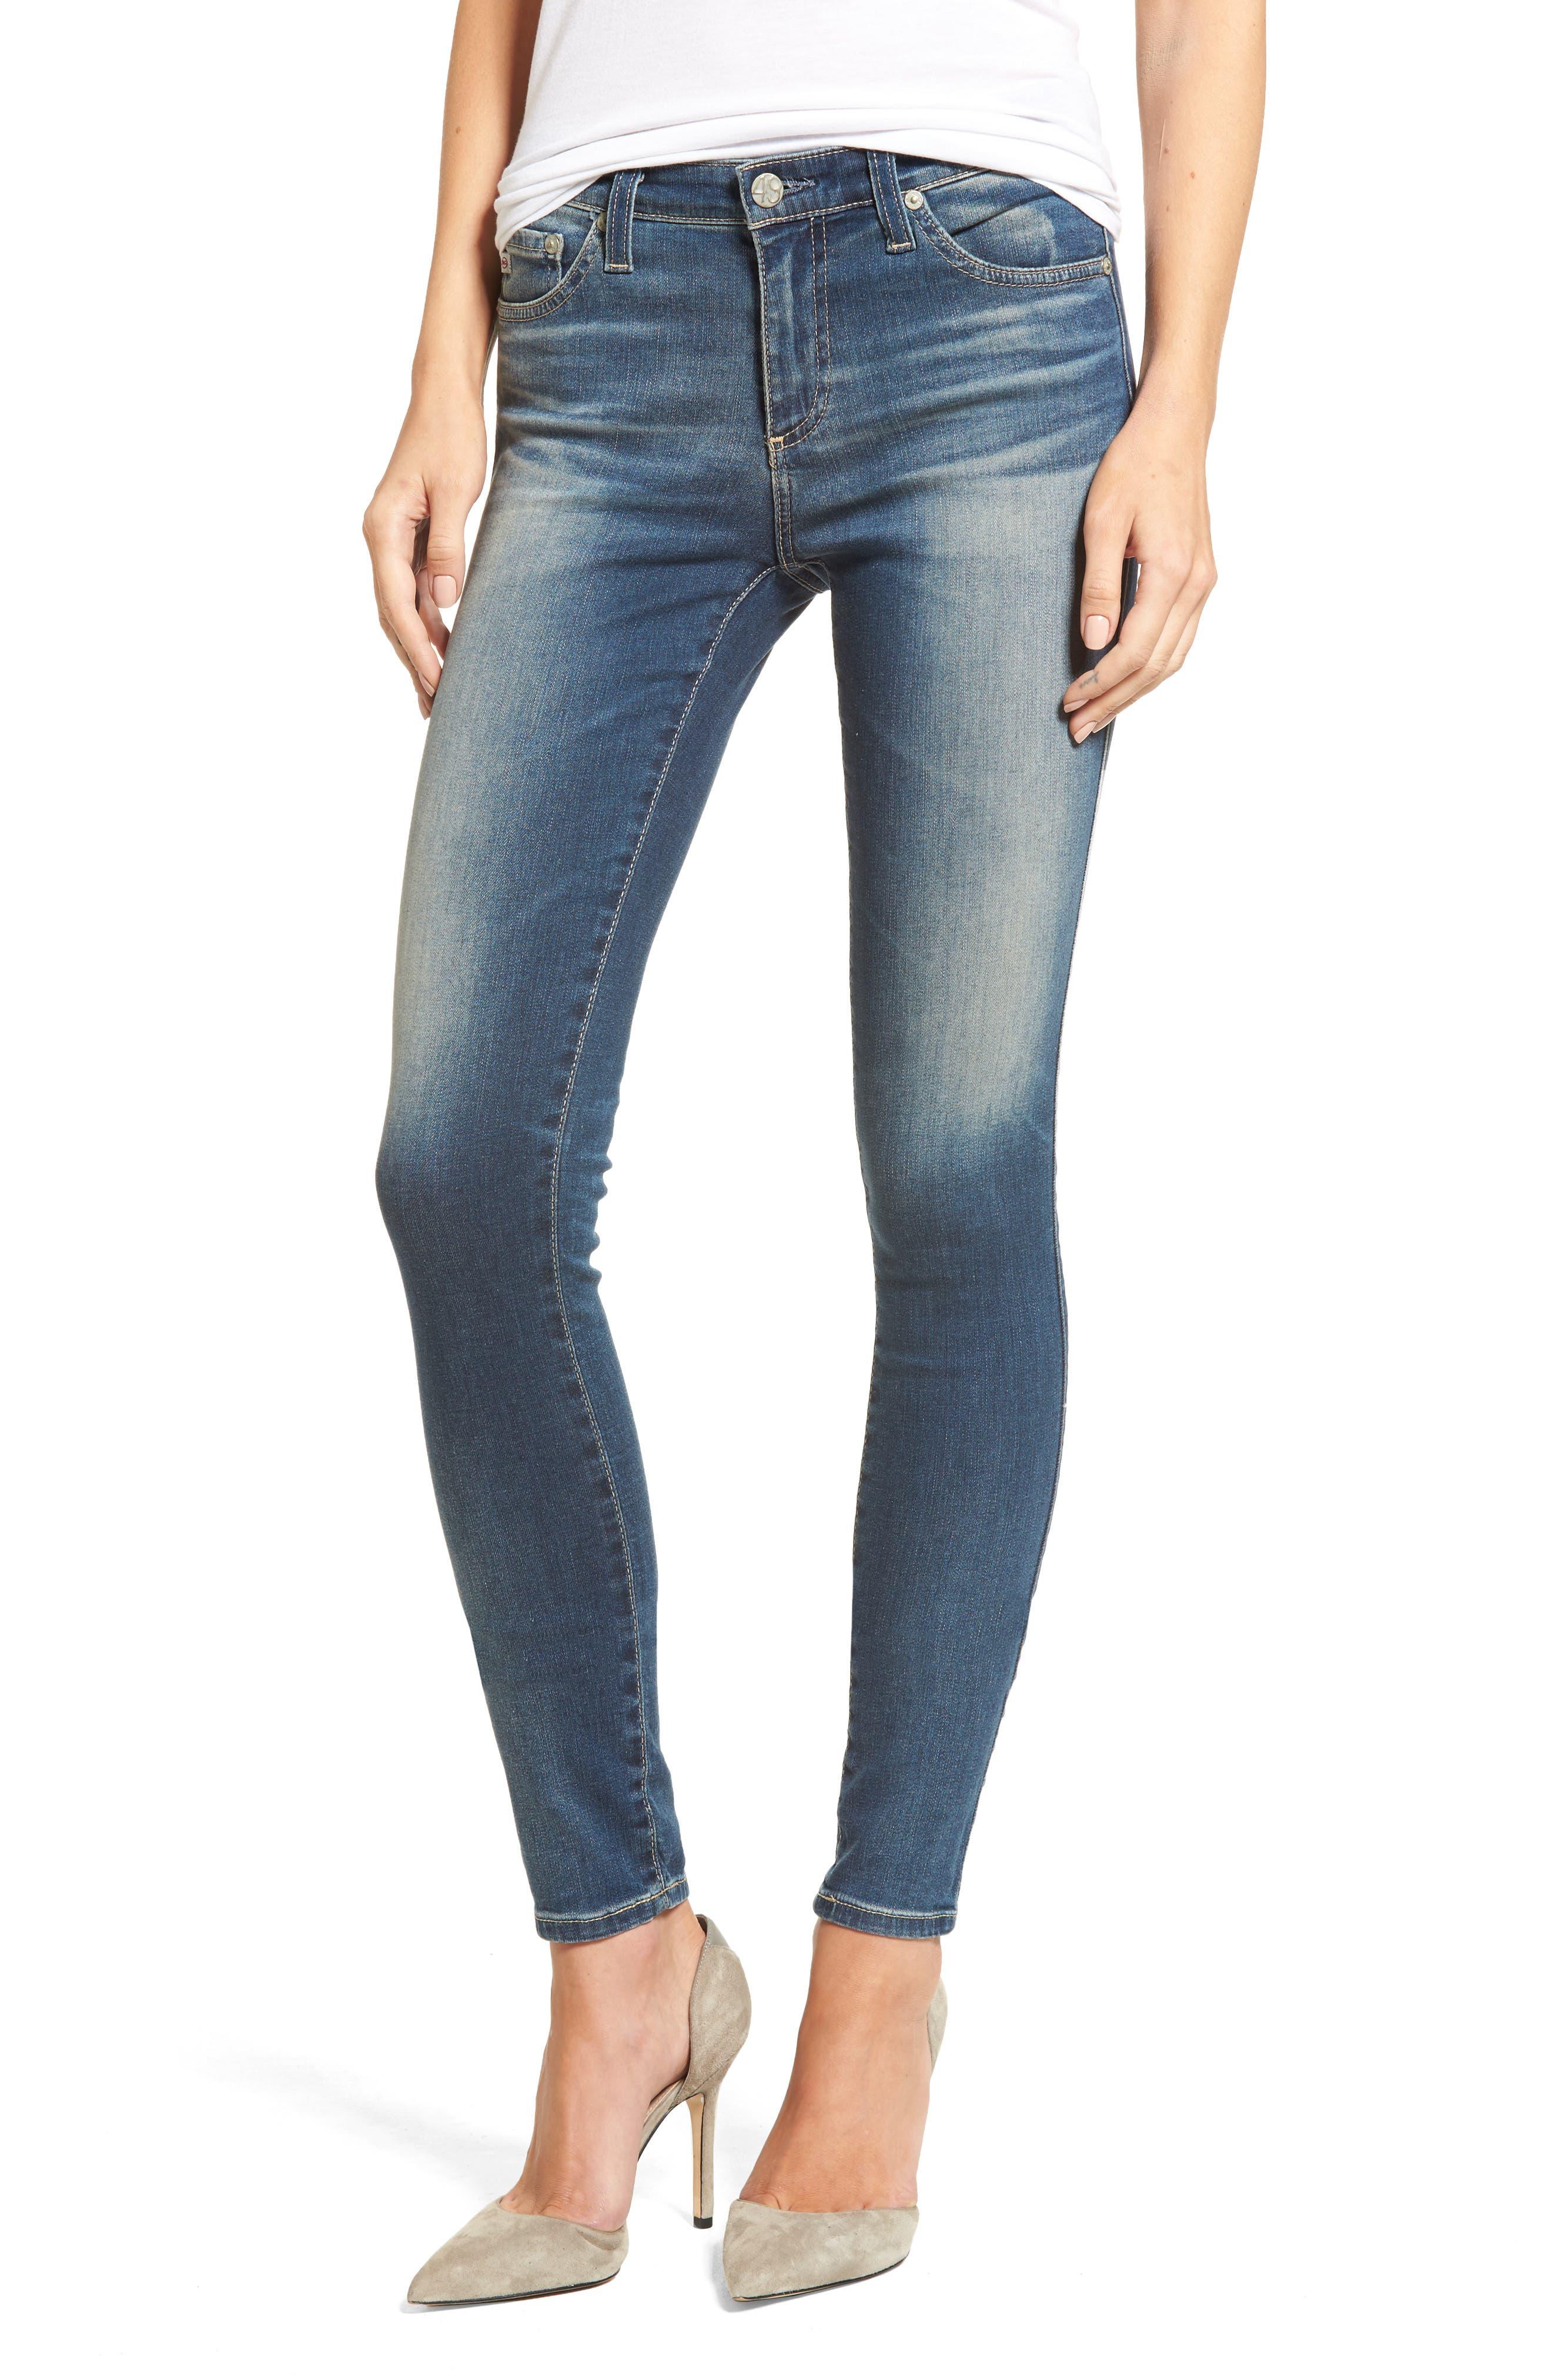 Main Image - AG The Legging Super Skinny Jeans (12 Years Abide)